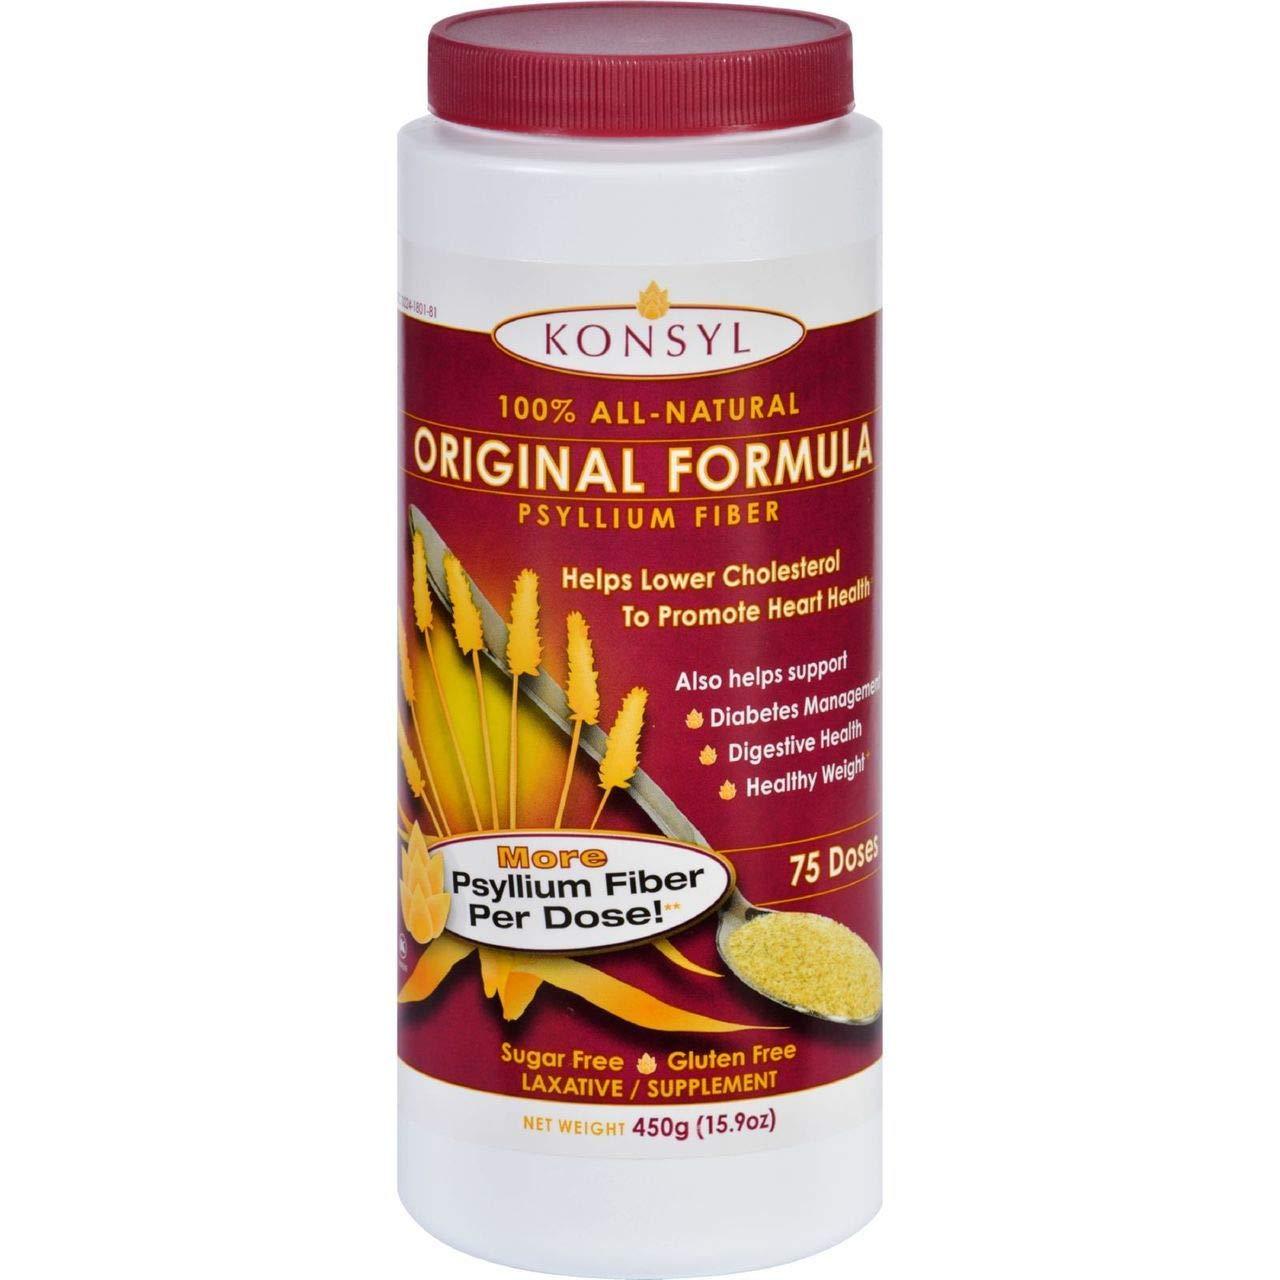 Konsyl Original Formula Psyllium Fiber 15.9 oz (450g) - 6 PACK